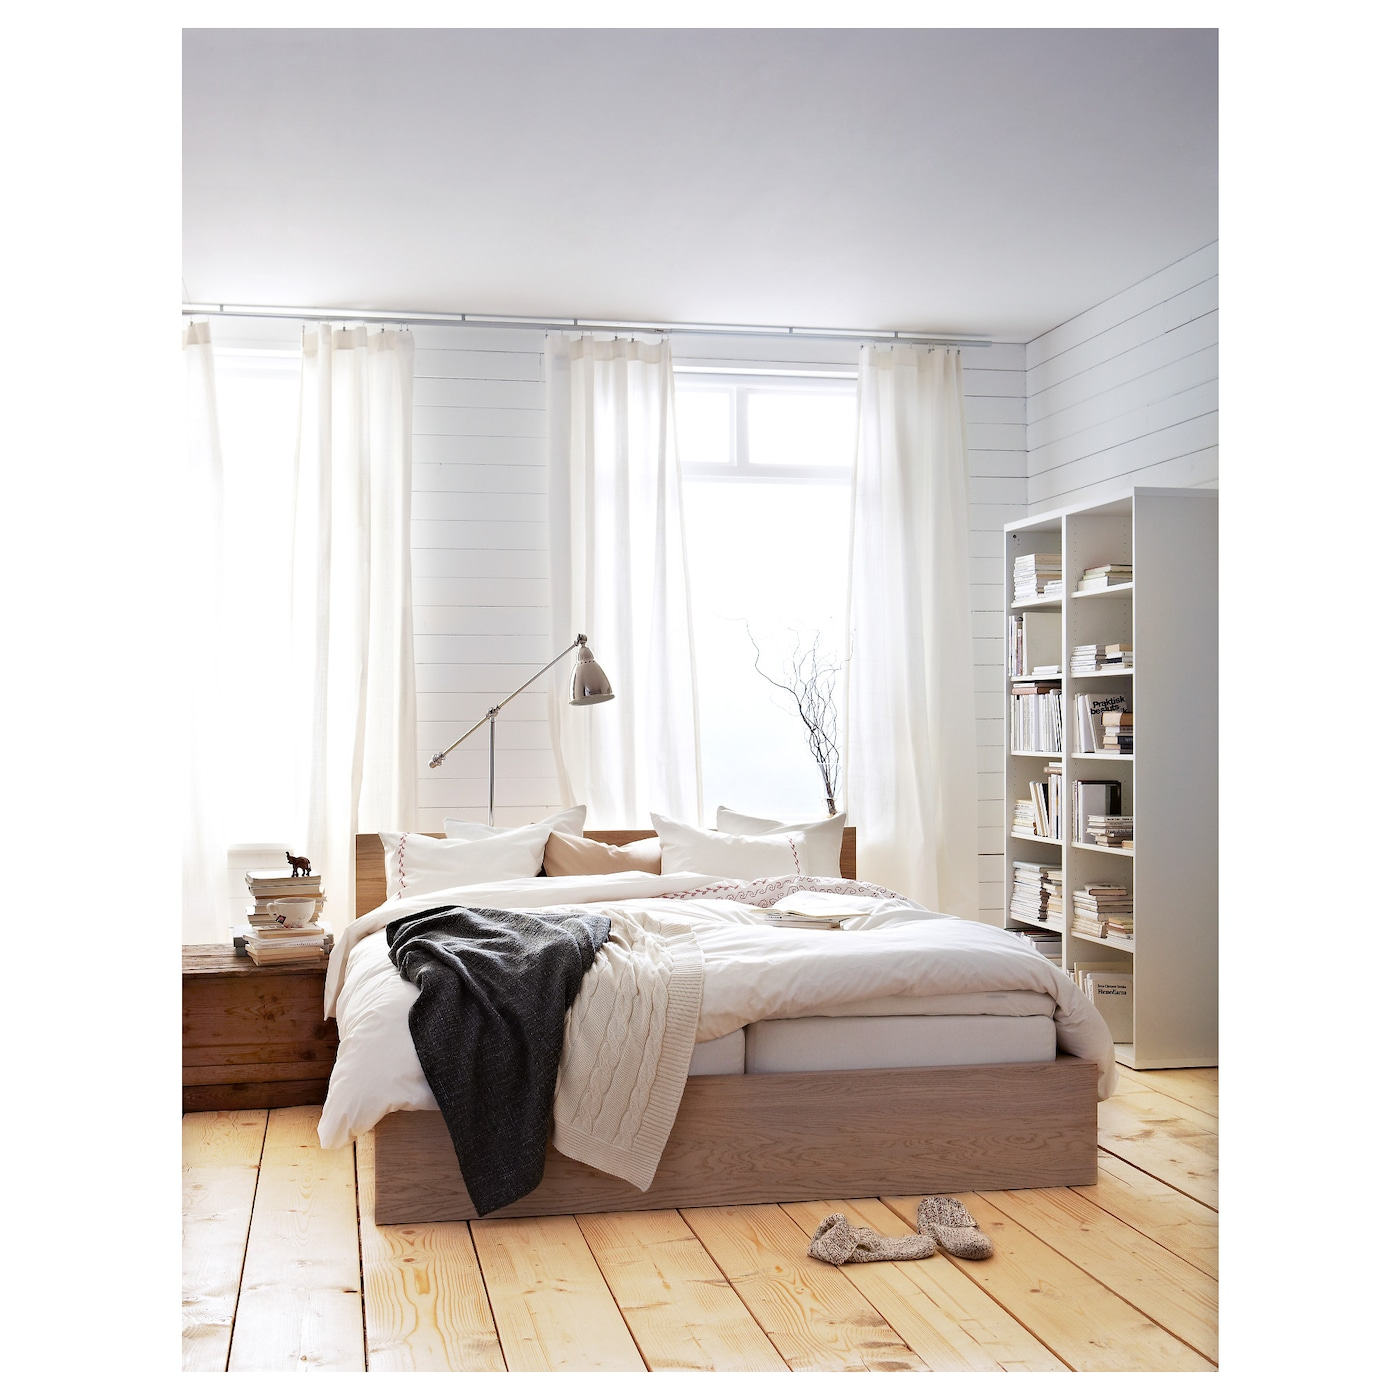 Malm estructura de cama alta chapa roble tinte blanco l nset 140 x 200 cm ikea - Estructura cama 180x200 ...